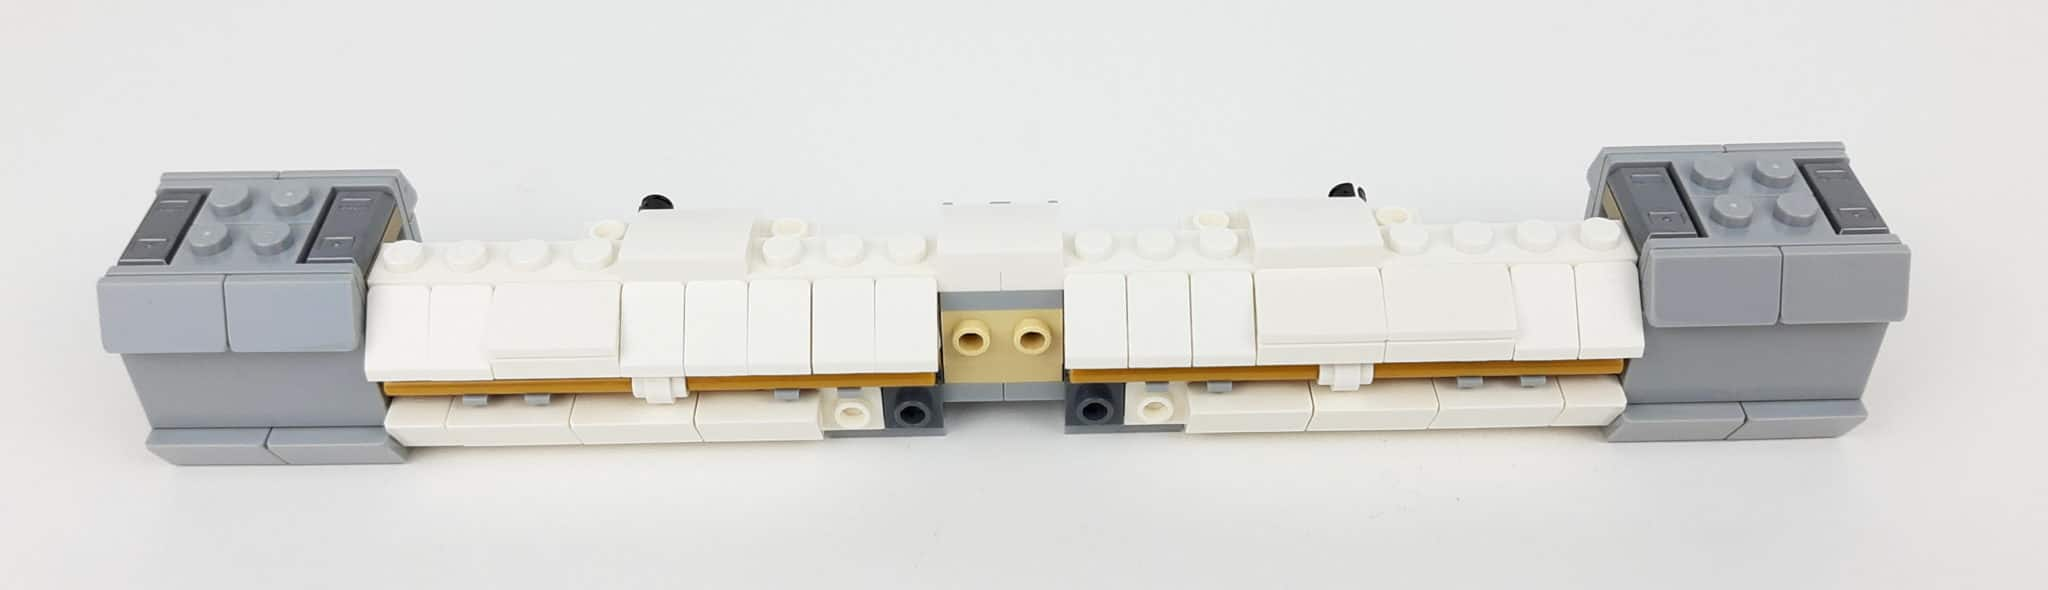 LEGO IDEAS 21321 - Bauabschnitt 3